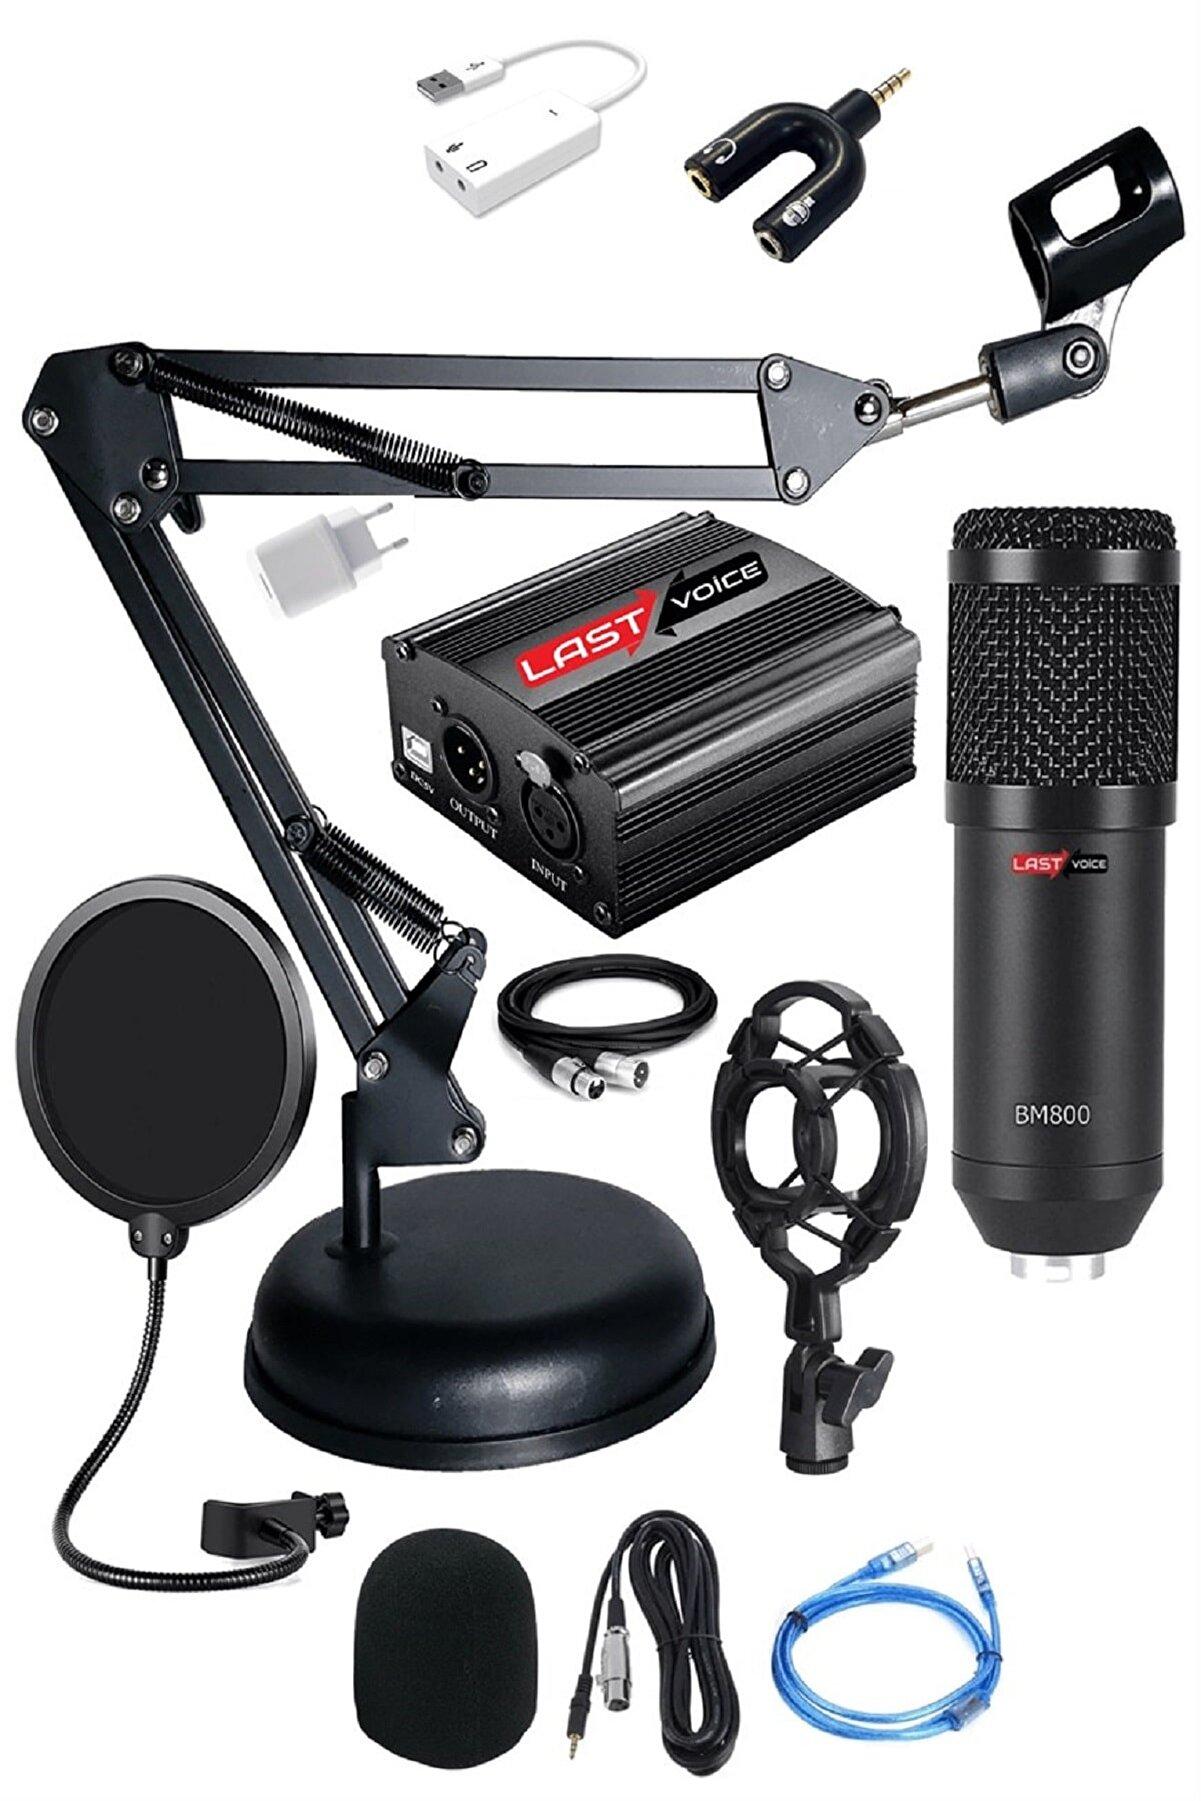 Lastvoice Bm800 Full Black Condenser Youtuber Stüdyo Mikrofonu